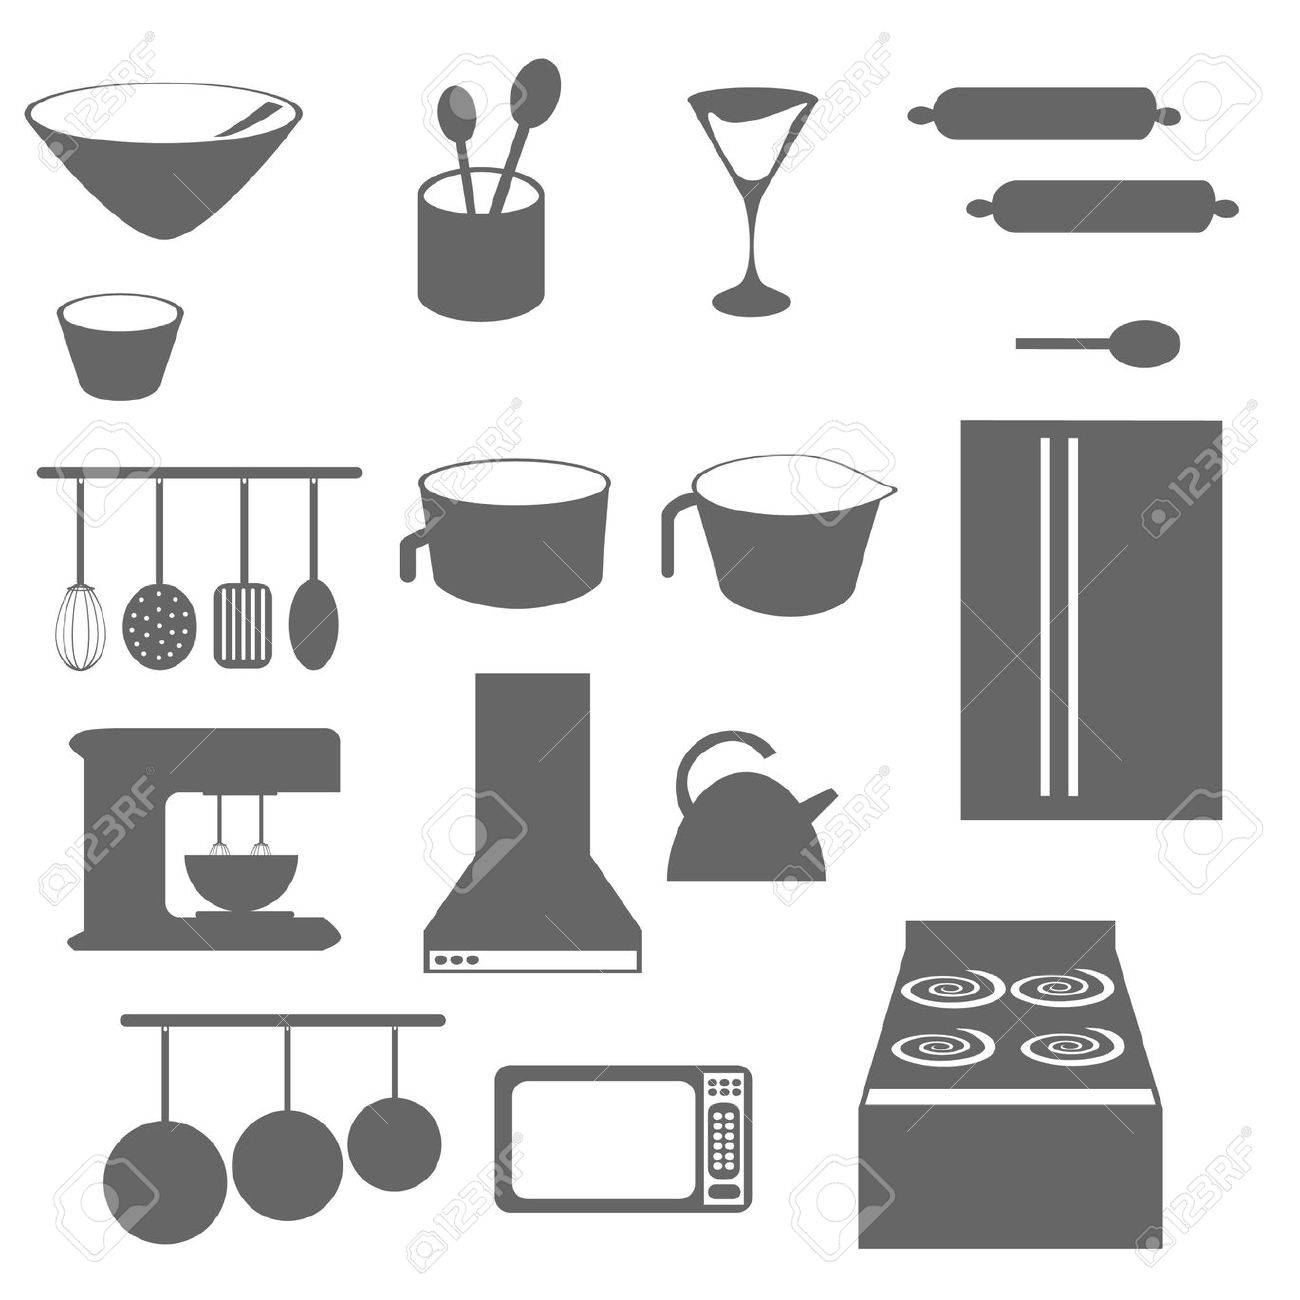 Emejing Oggetti Di Cucina Photos - Ameripest.us - ameripest.us